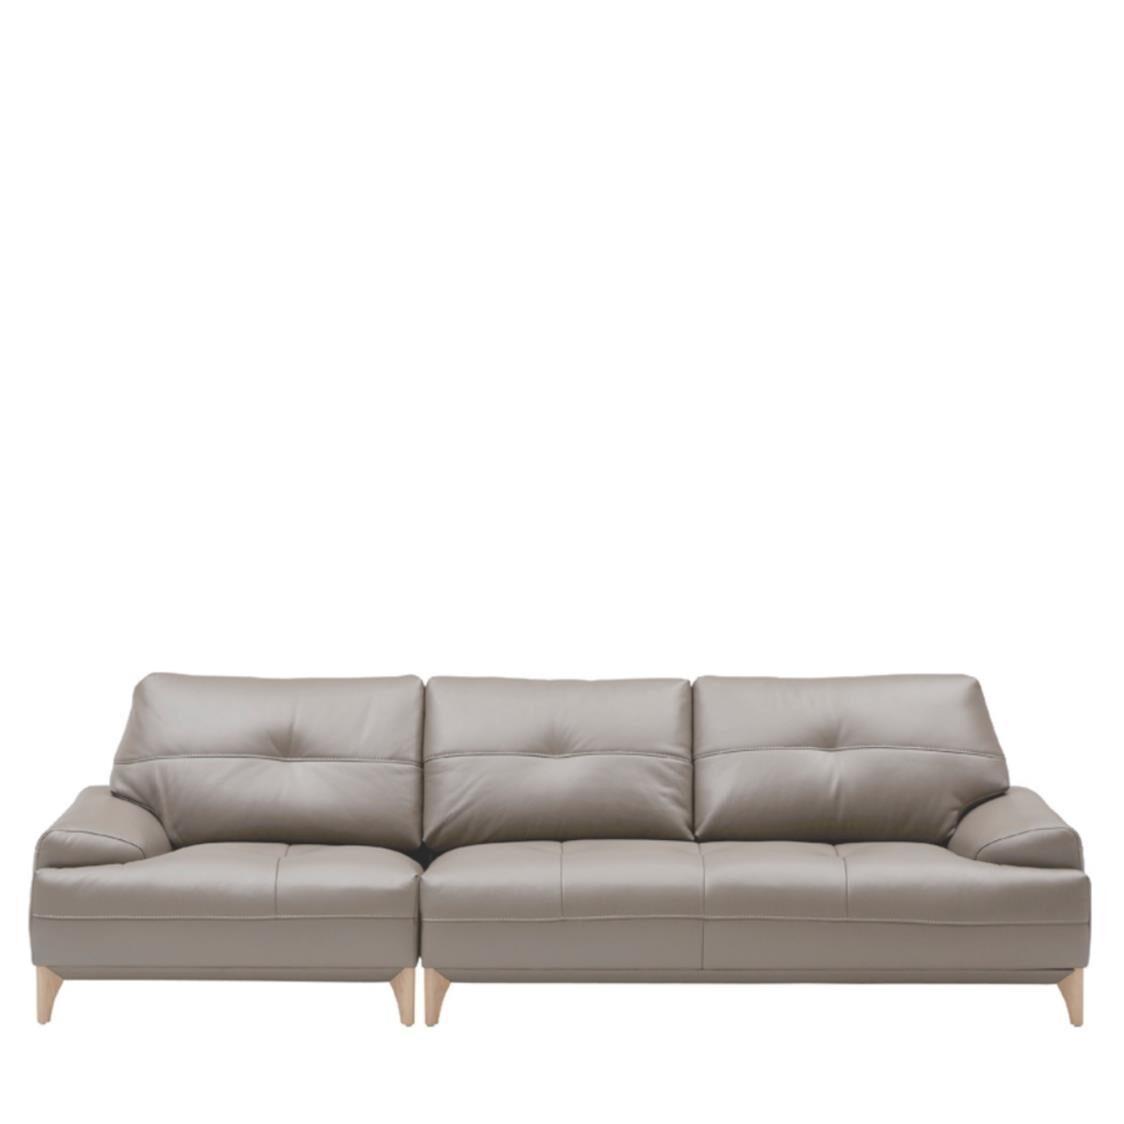 Iloom Boston Leather Sofa For 4  L390 Nude